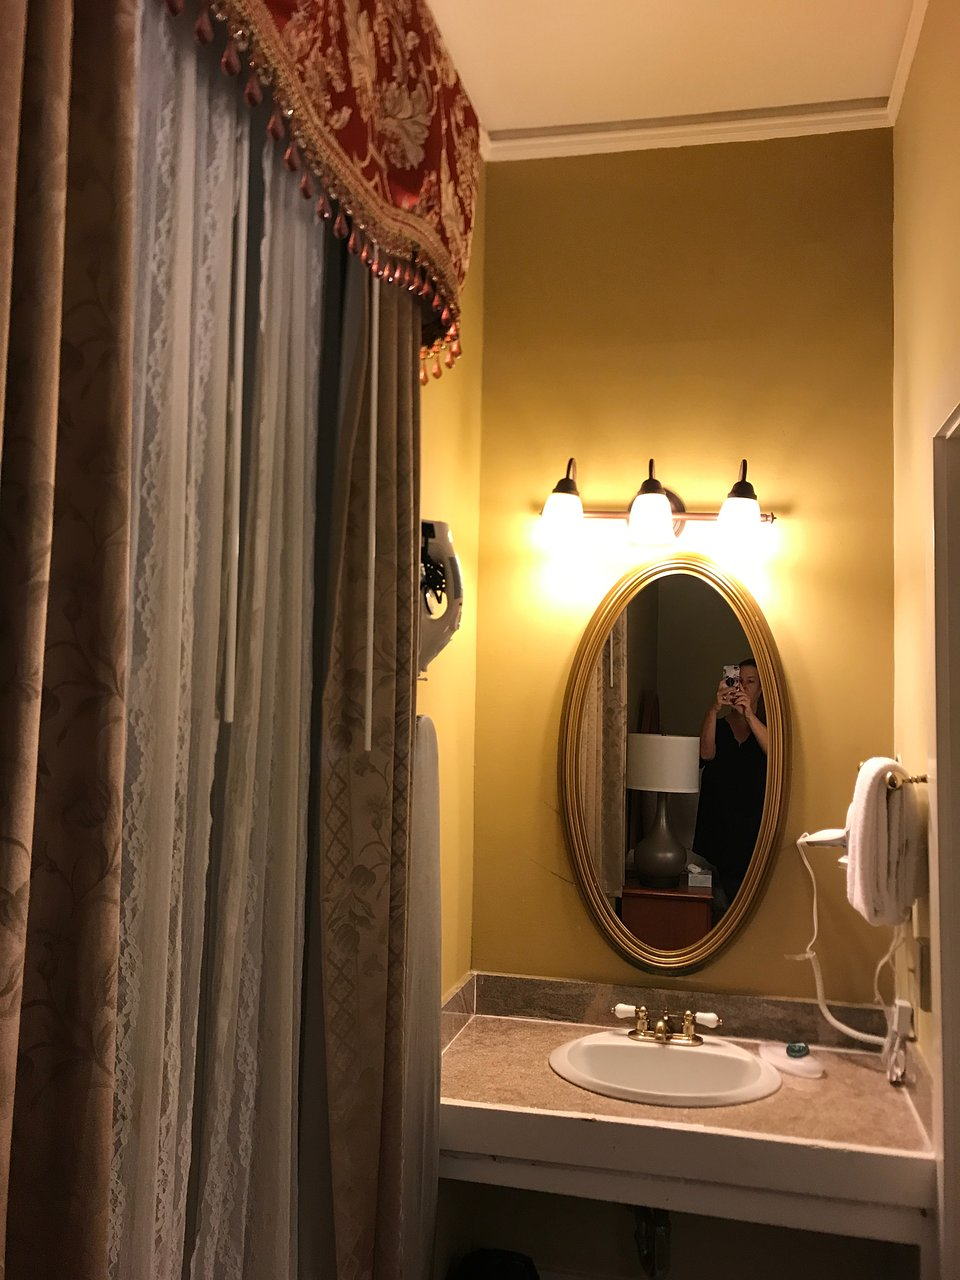 ROSE GARDEN INN - Updated 2018 Prices & Hotel Reviews (Berkeley, CA ...